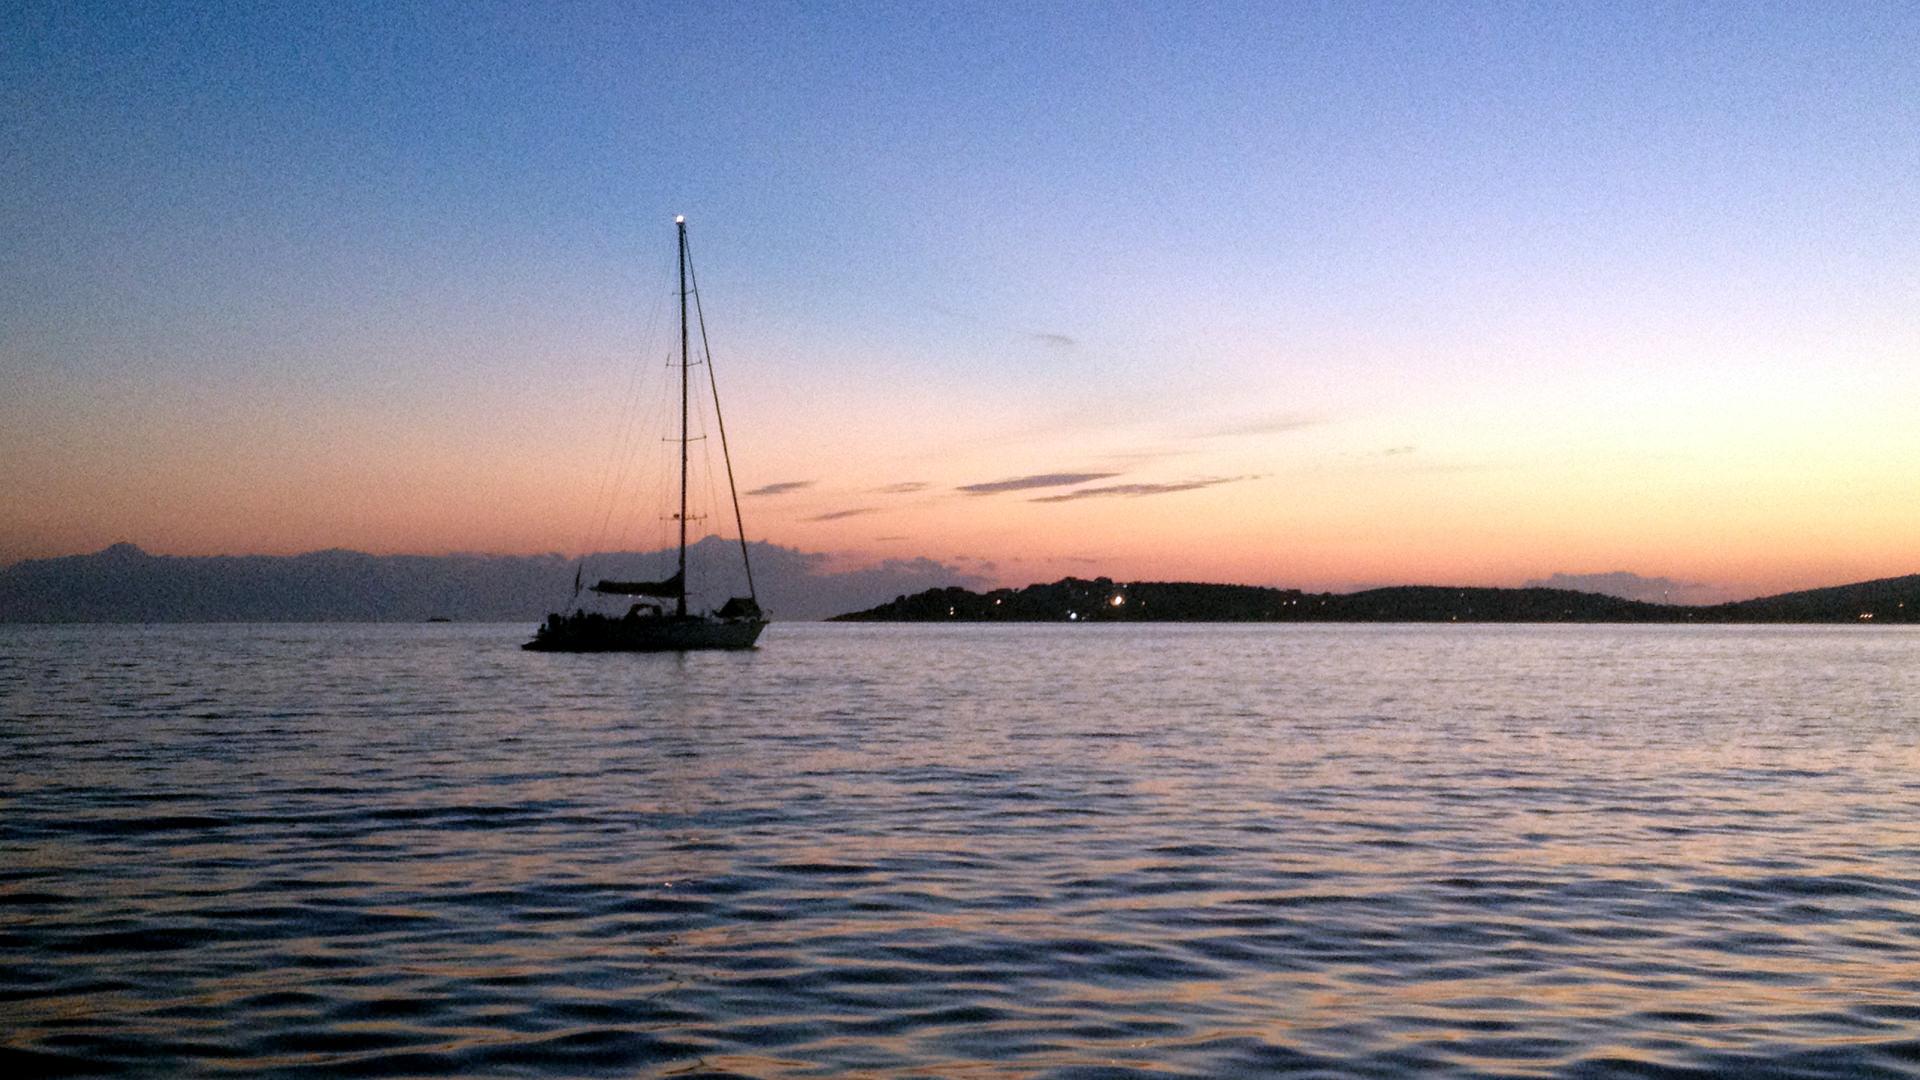 vacanze in barca a vela crociere